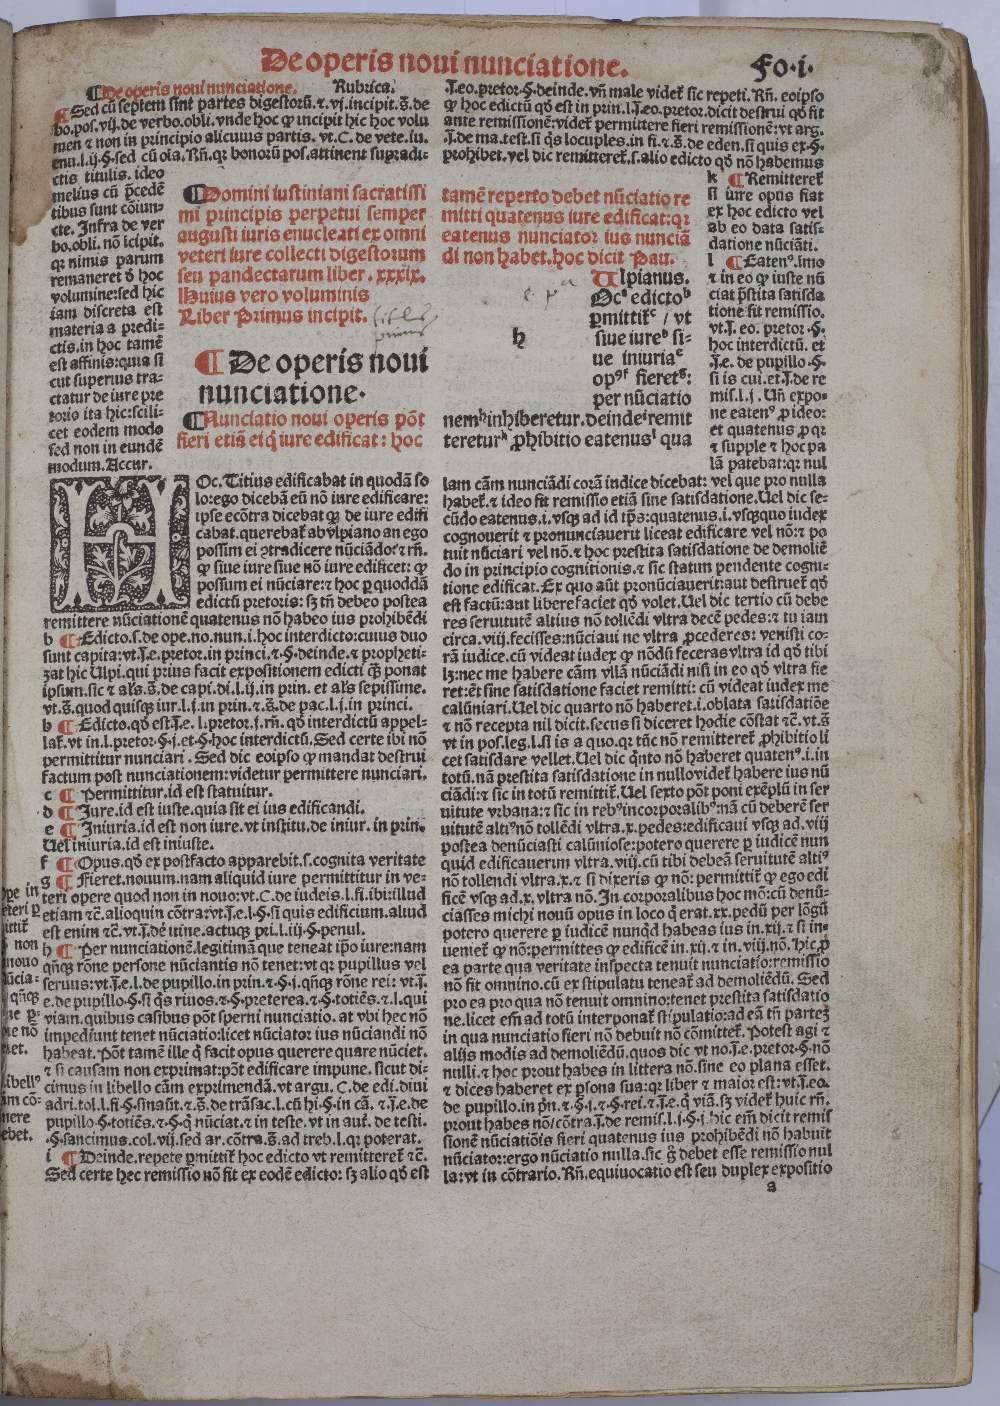 BOUCARD, ANDREAS (Ed.), Justinian, Digestorum Seu Pandectar, Joannis Petit, Paris 1525. 12 books - Image 2 of 5